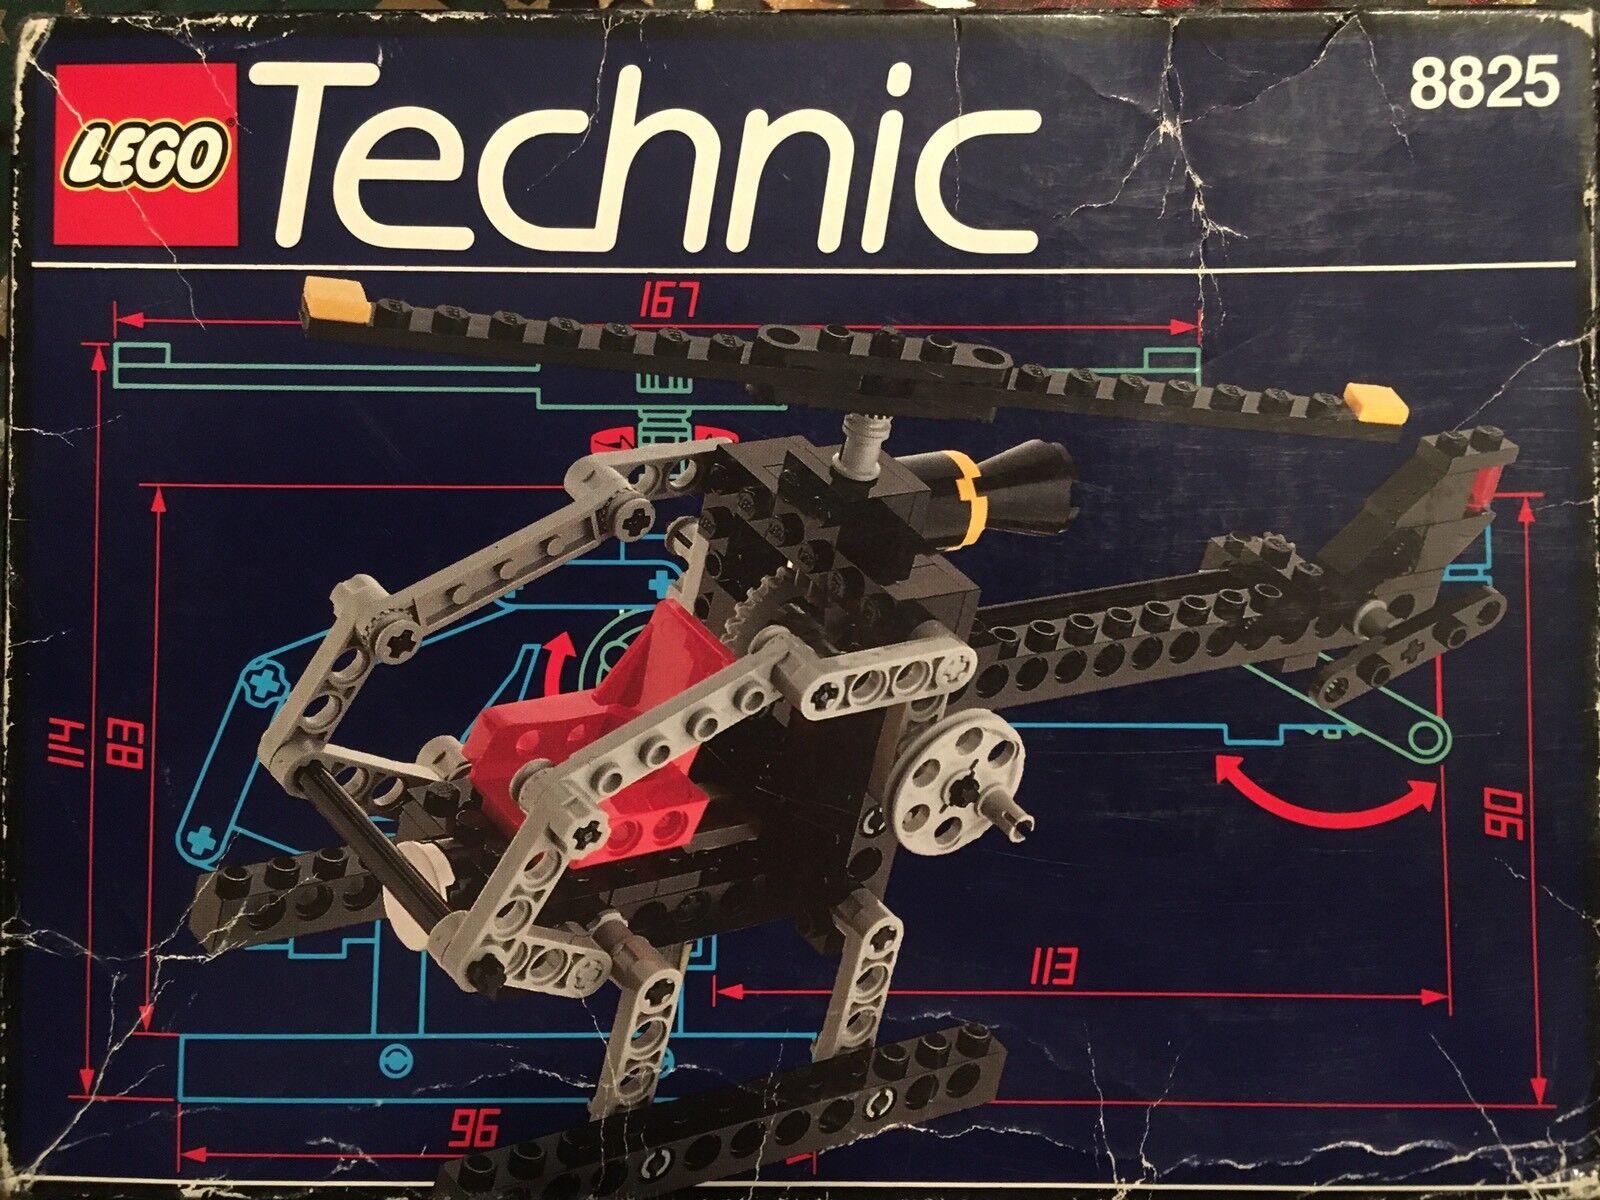 LEGO TECHNIC Elicottero Notturno(Night Chopper) 8825